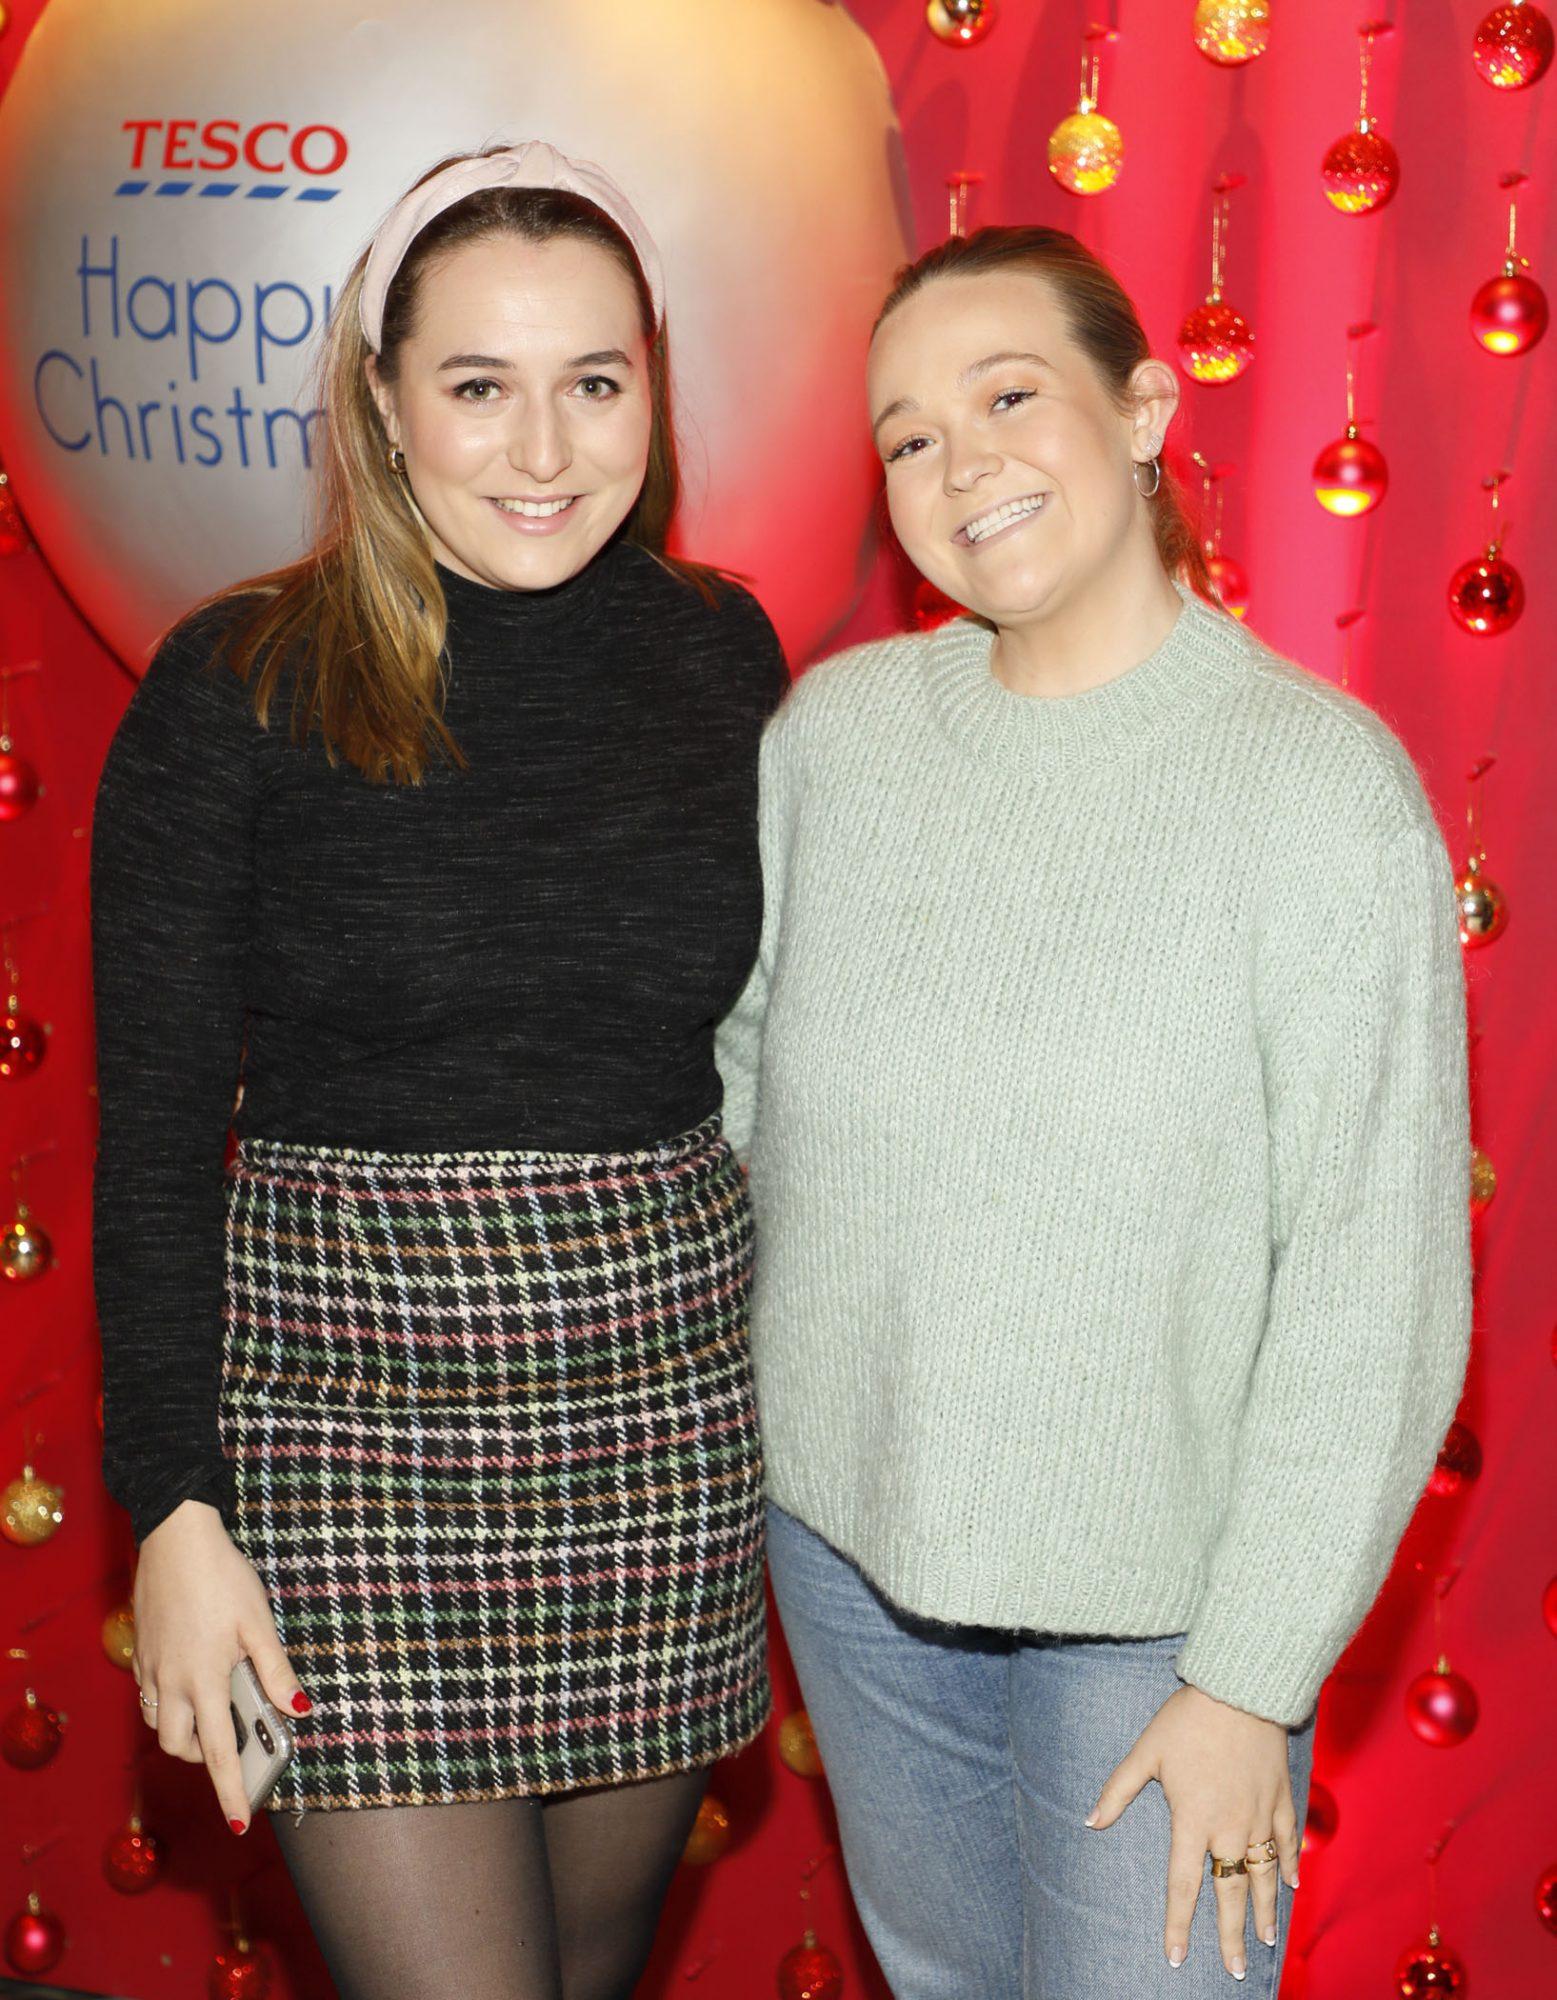 Lorna Lawless and Blaithin Gallagher at the Tesco 2019 Christmas Showcase in Dublin's Iveagh Garden Hotel.   Photo: Kieran Harnett